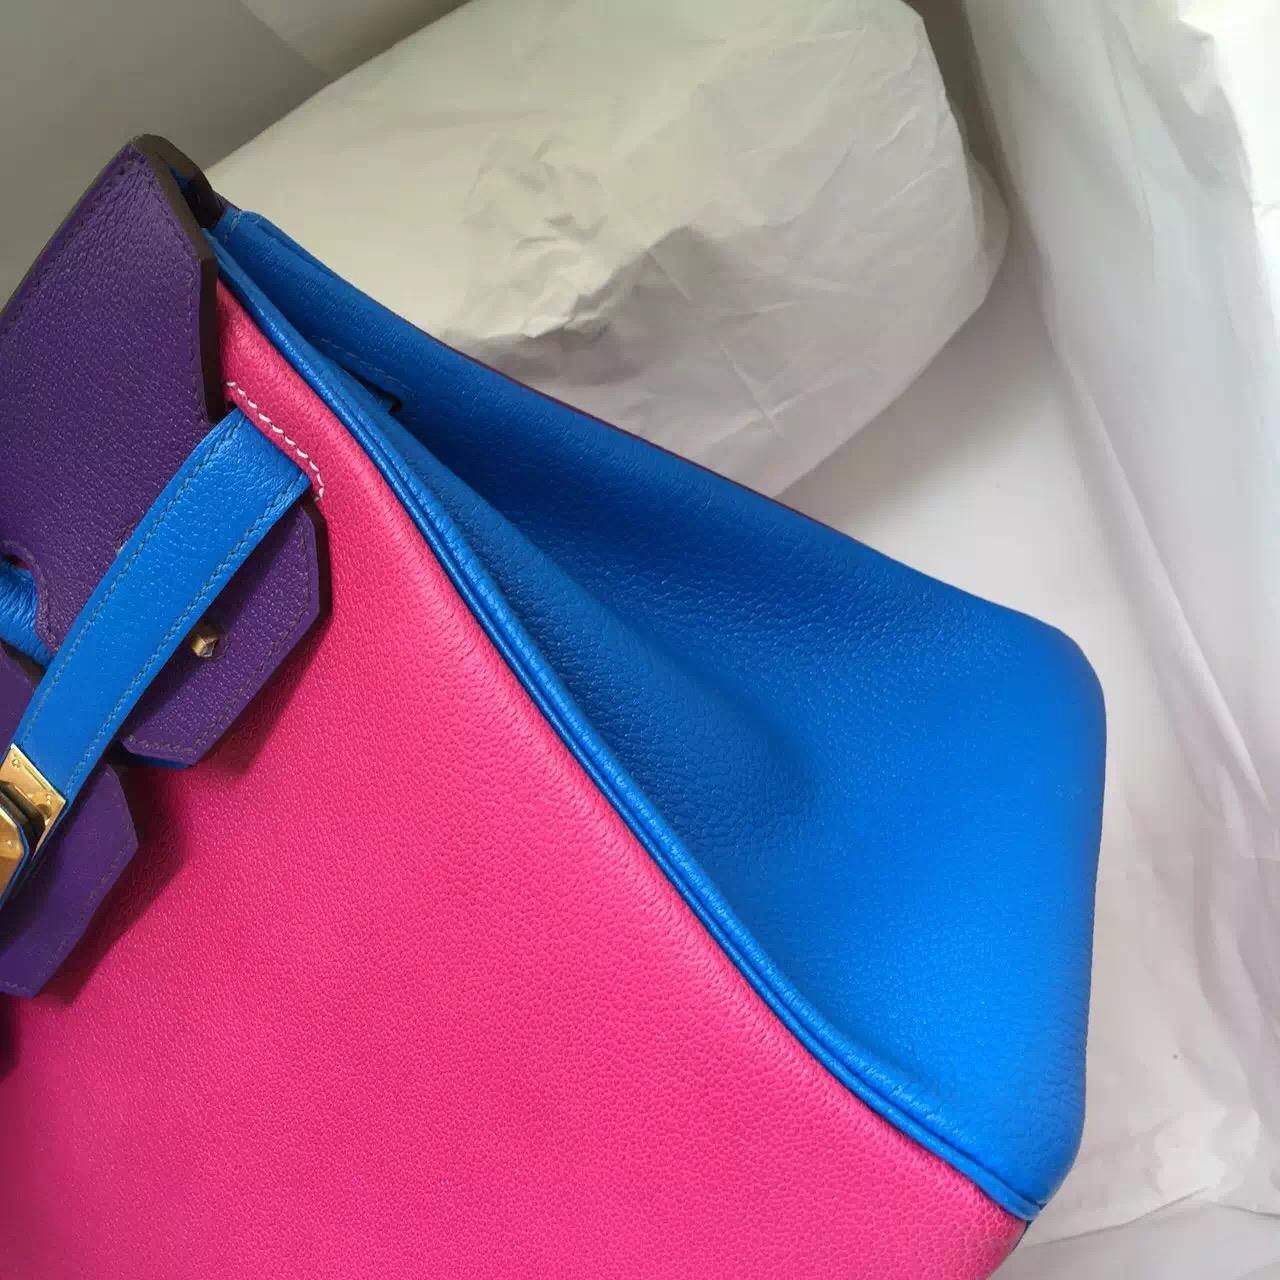 Wholesale Hermes Three Colors Chevre Leather Birkin Bag 30CM Luxury Women's Handbag